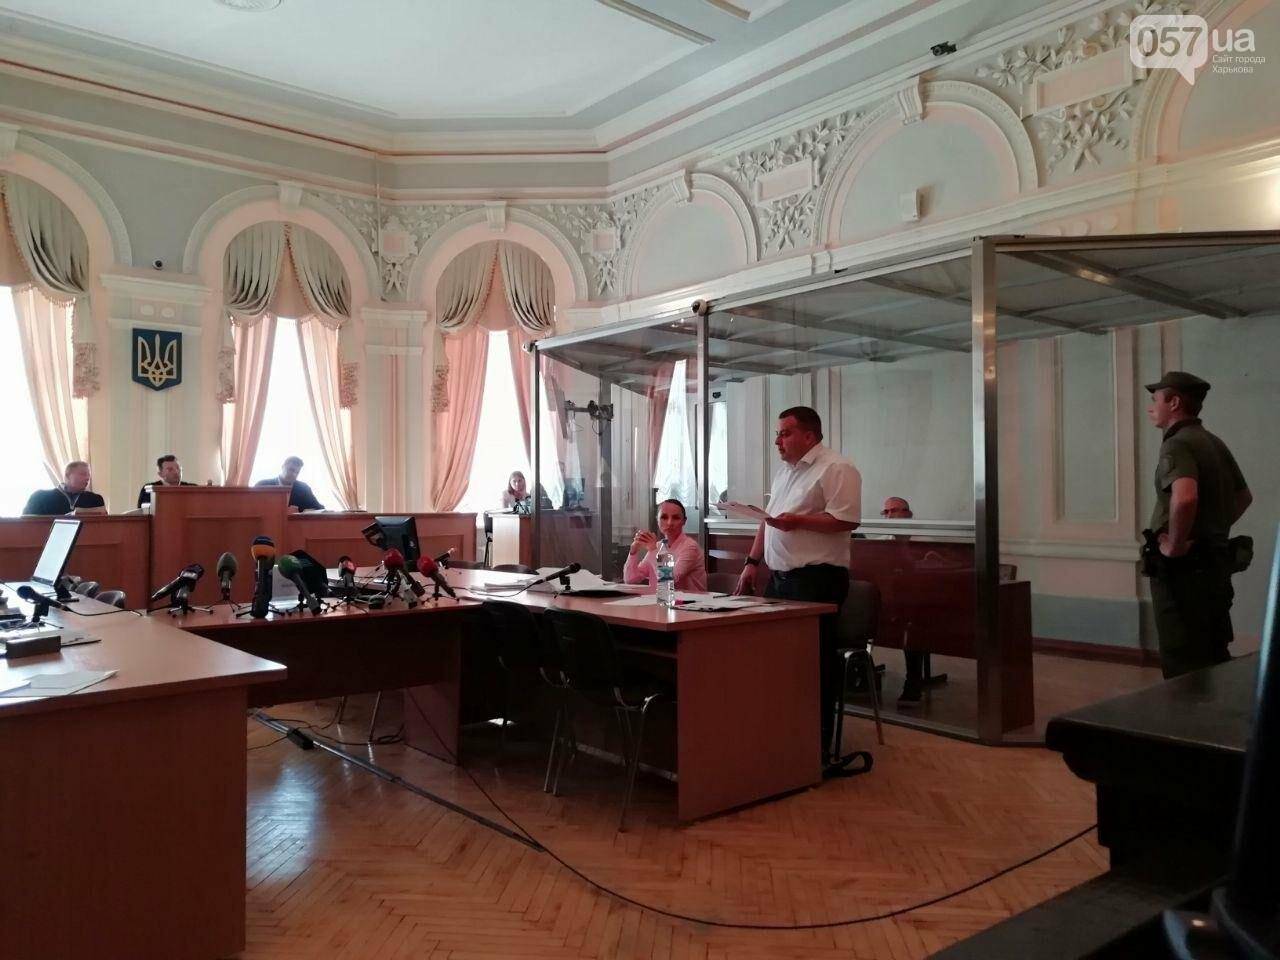 Апелляция по делу ДТП на Сумской: суд оставил приговор без изменений, - ОНЛАЙН-ТРАНСЛЯЦИЯ, фото-11